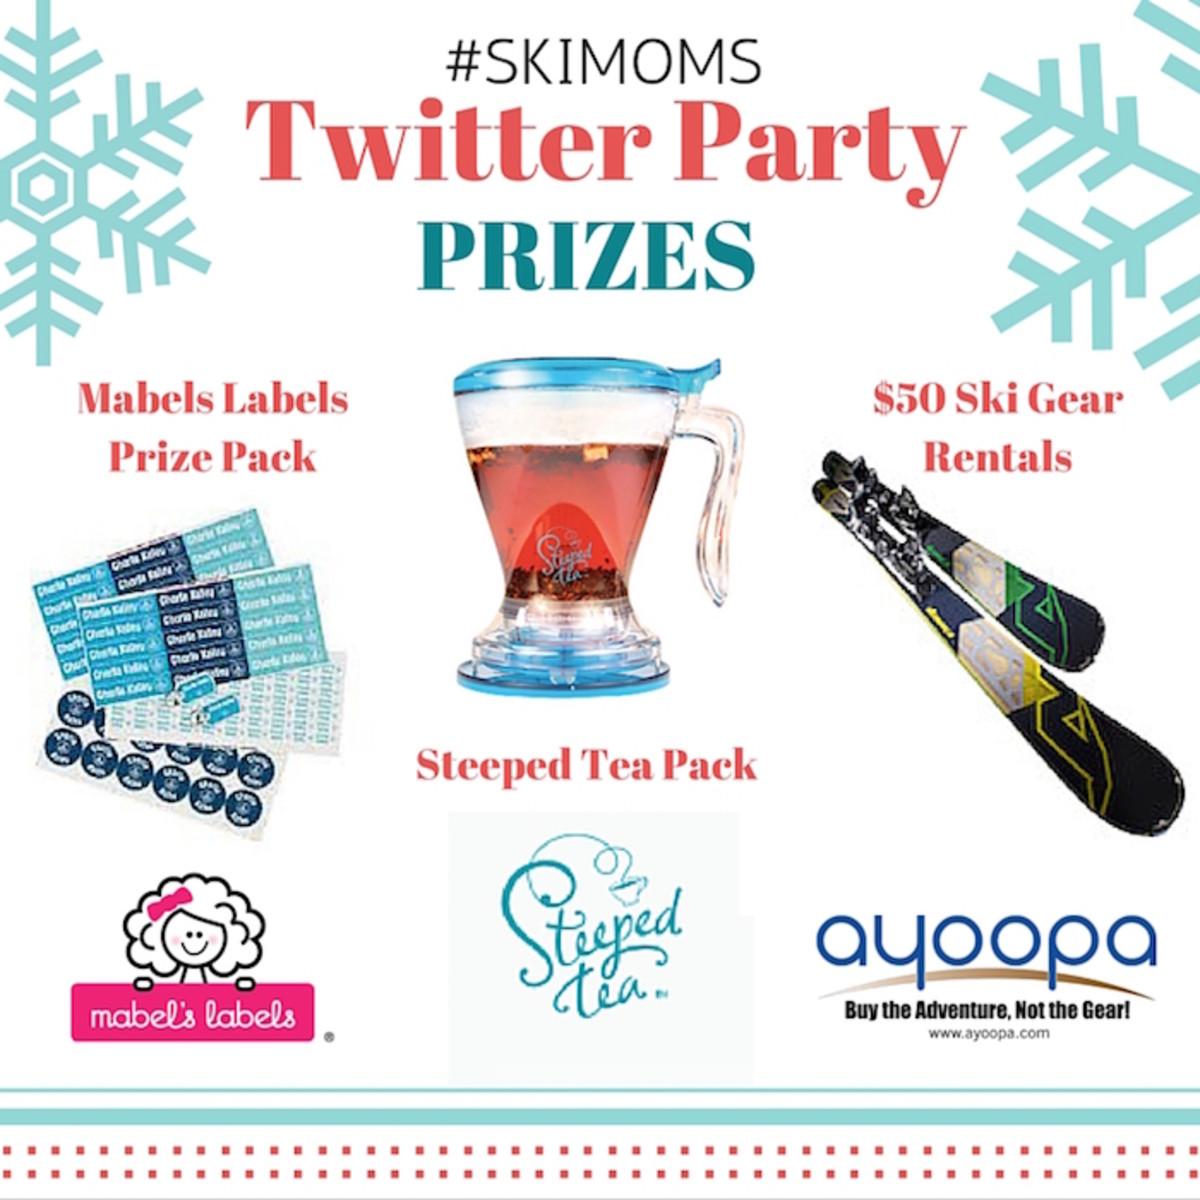 Ski party prizing